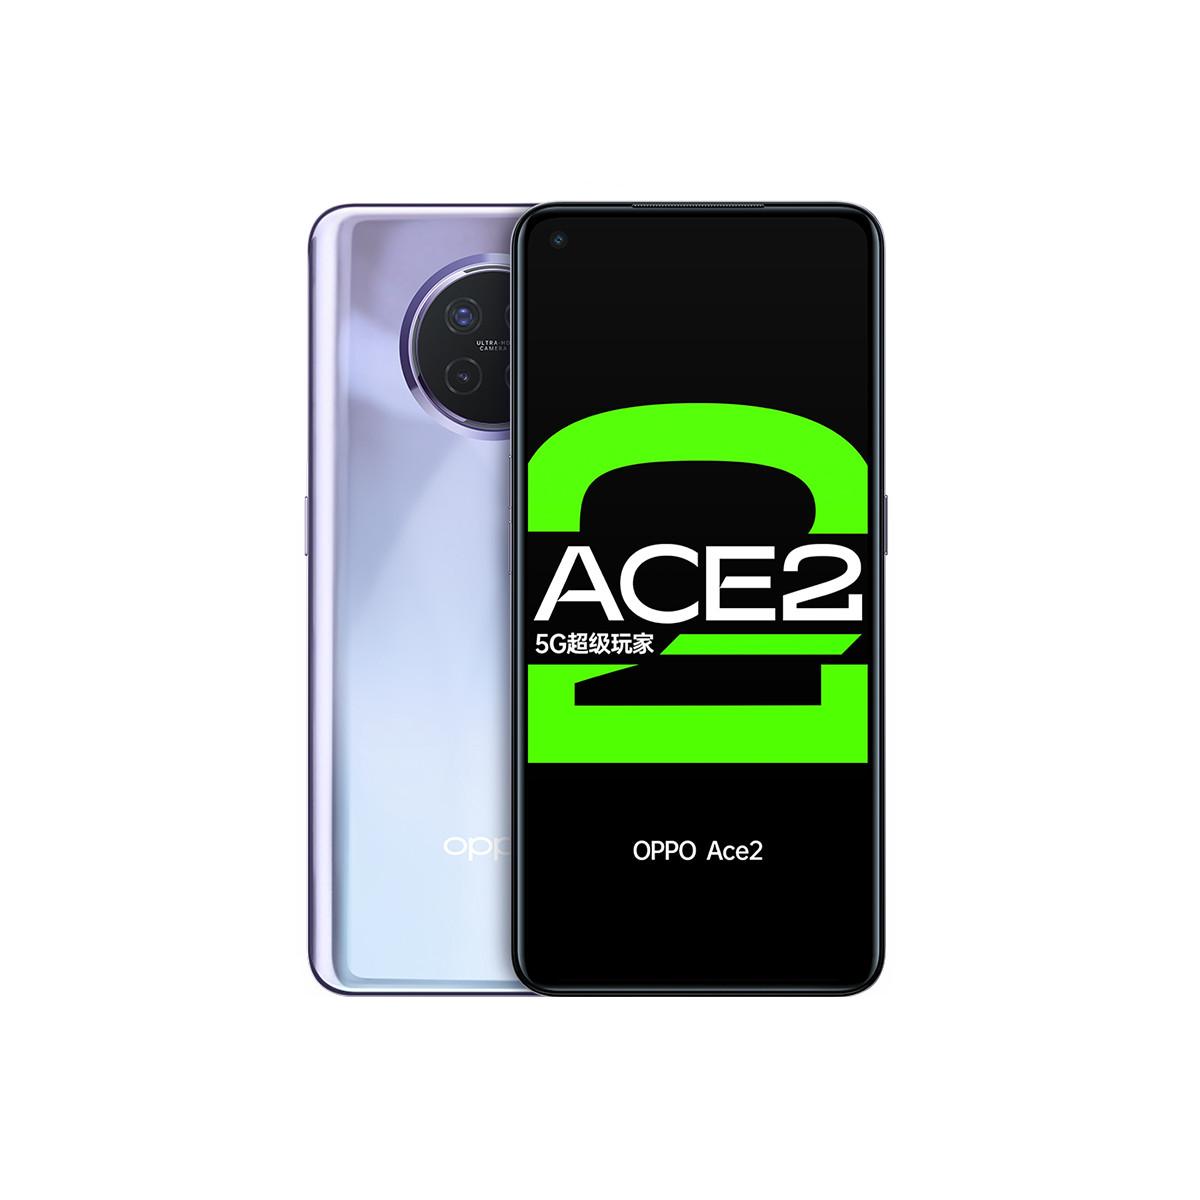 OPPOOPPO Ace2 无线耳机套餐全网通5G无线闪充游戏智能手机Ace2梦幻紫